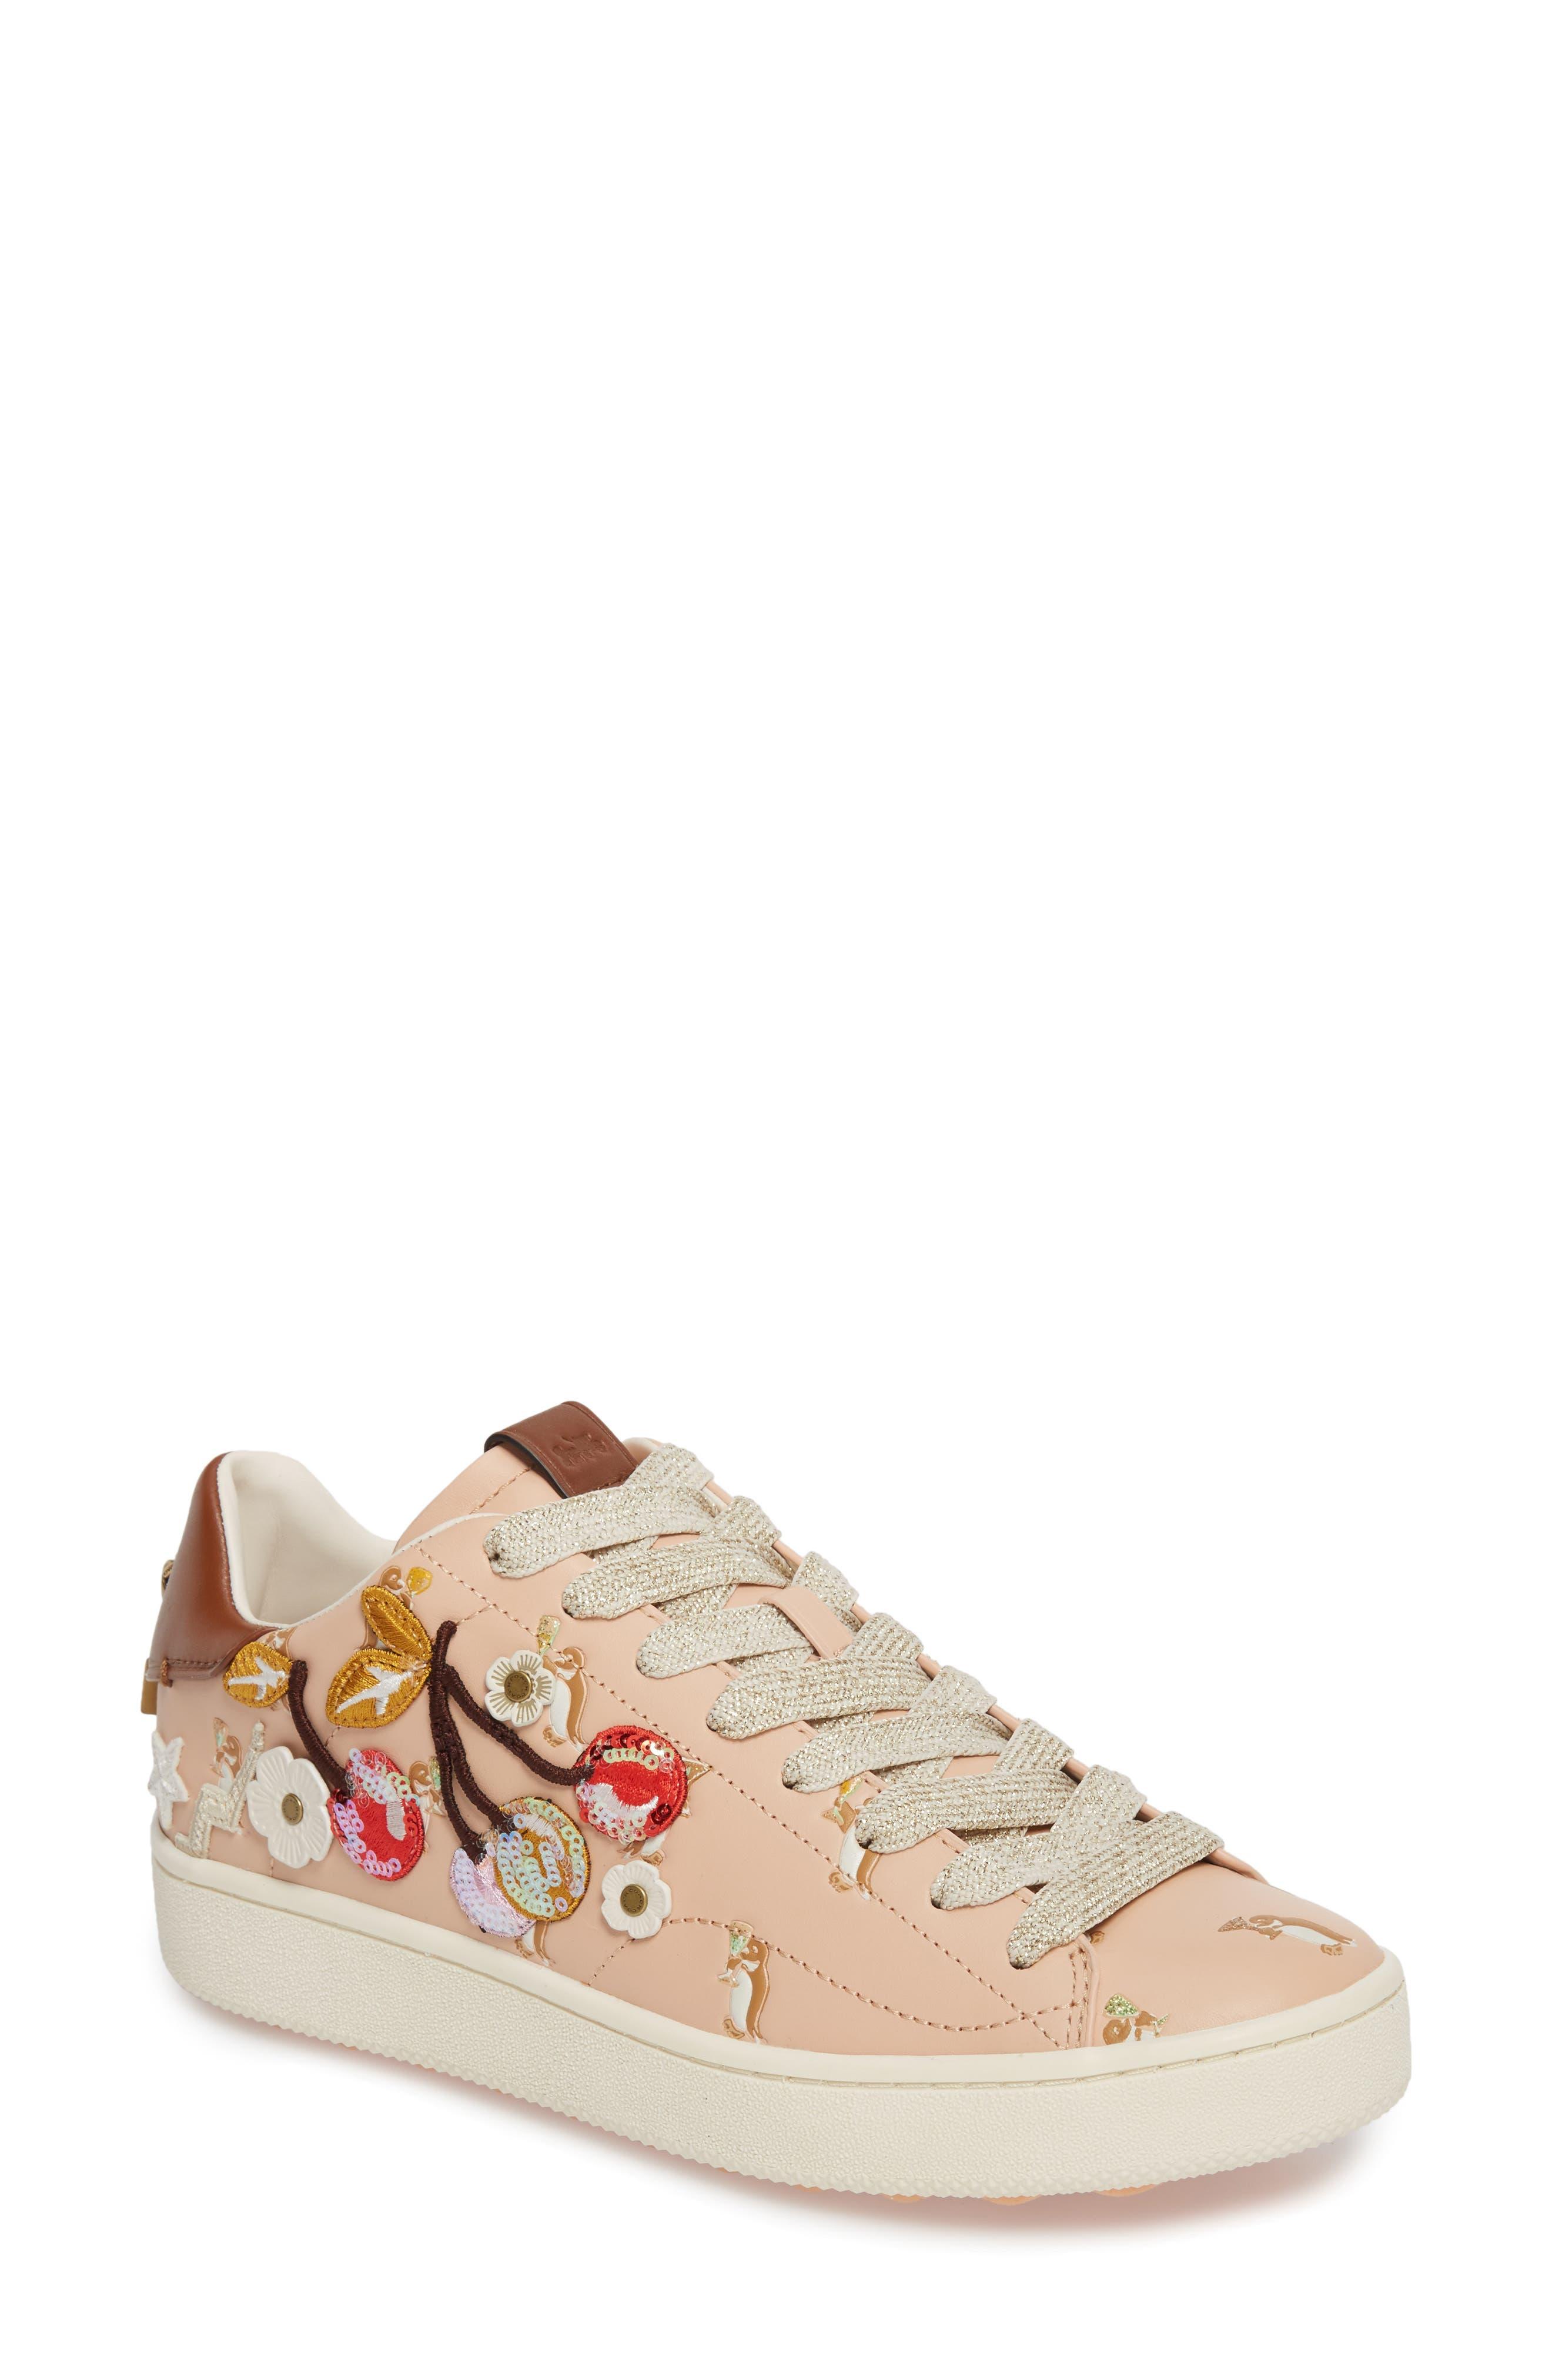 Patch Sneaker,                         Main,                         color, 650